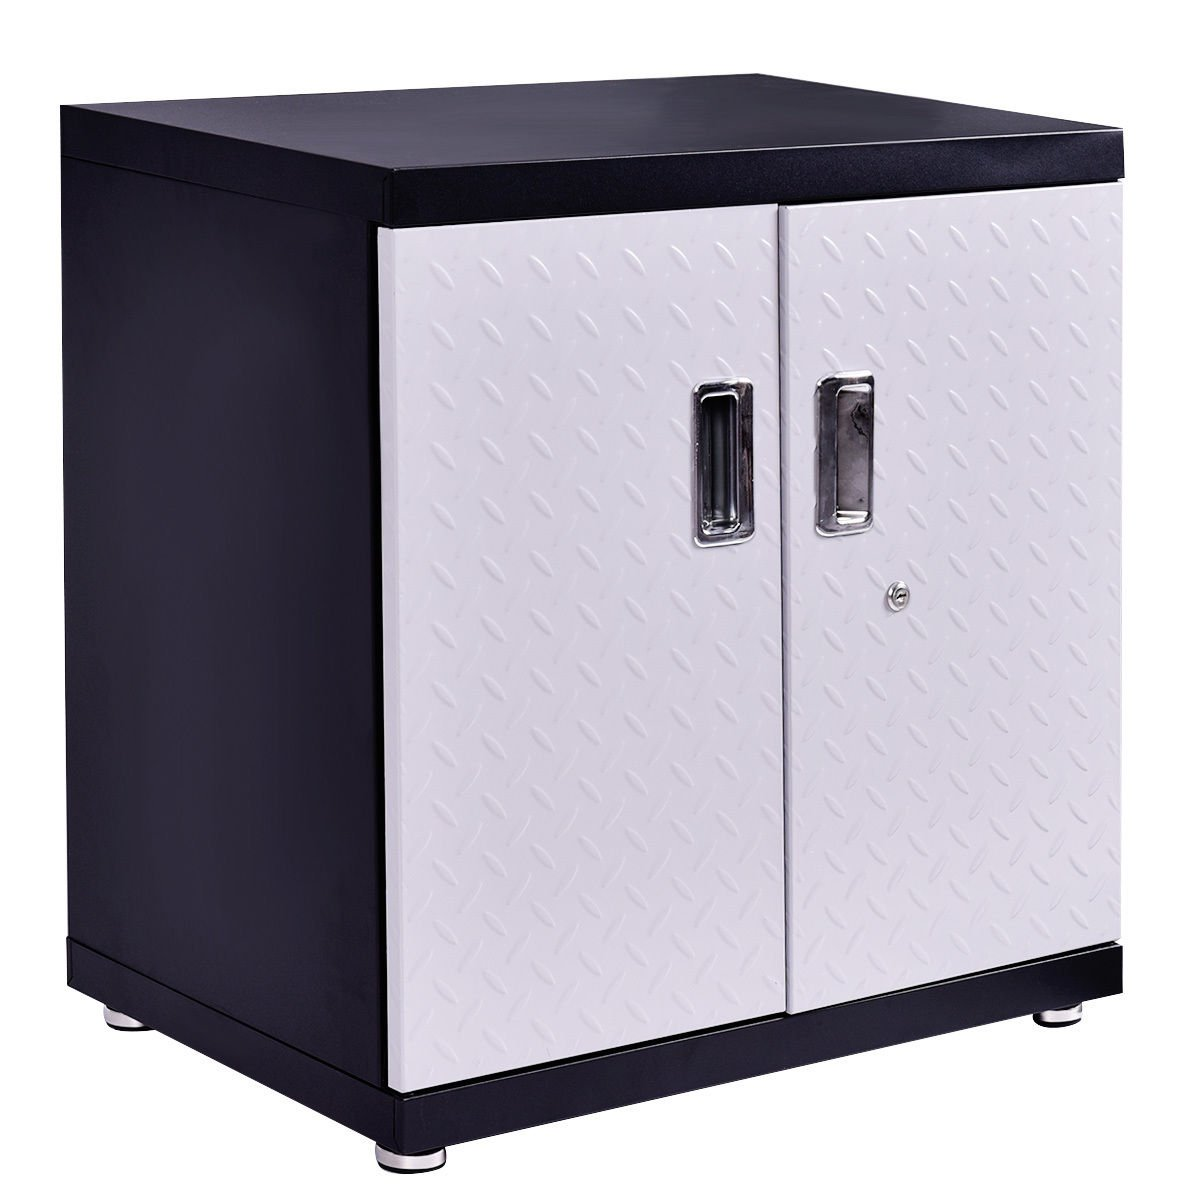 Wall Mount Cabinet Metal Garage Steel Black&SilverStorage Box Organizer 2 Shelves Tool New